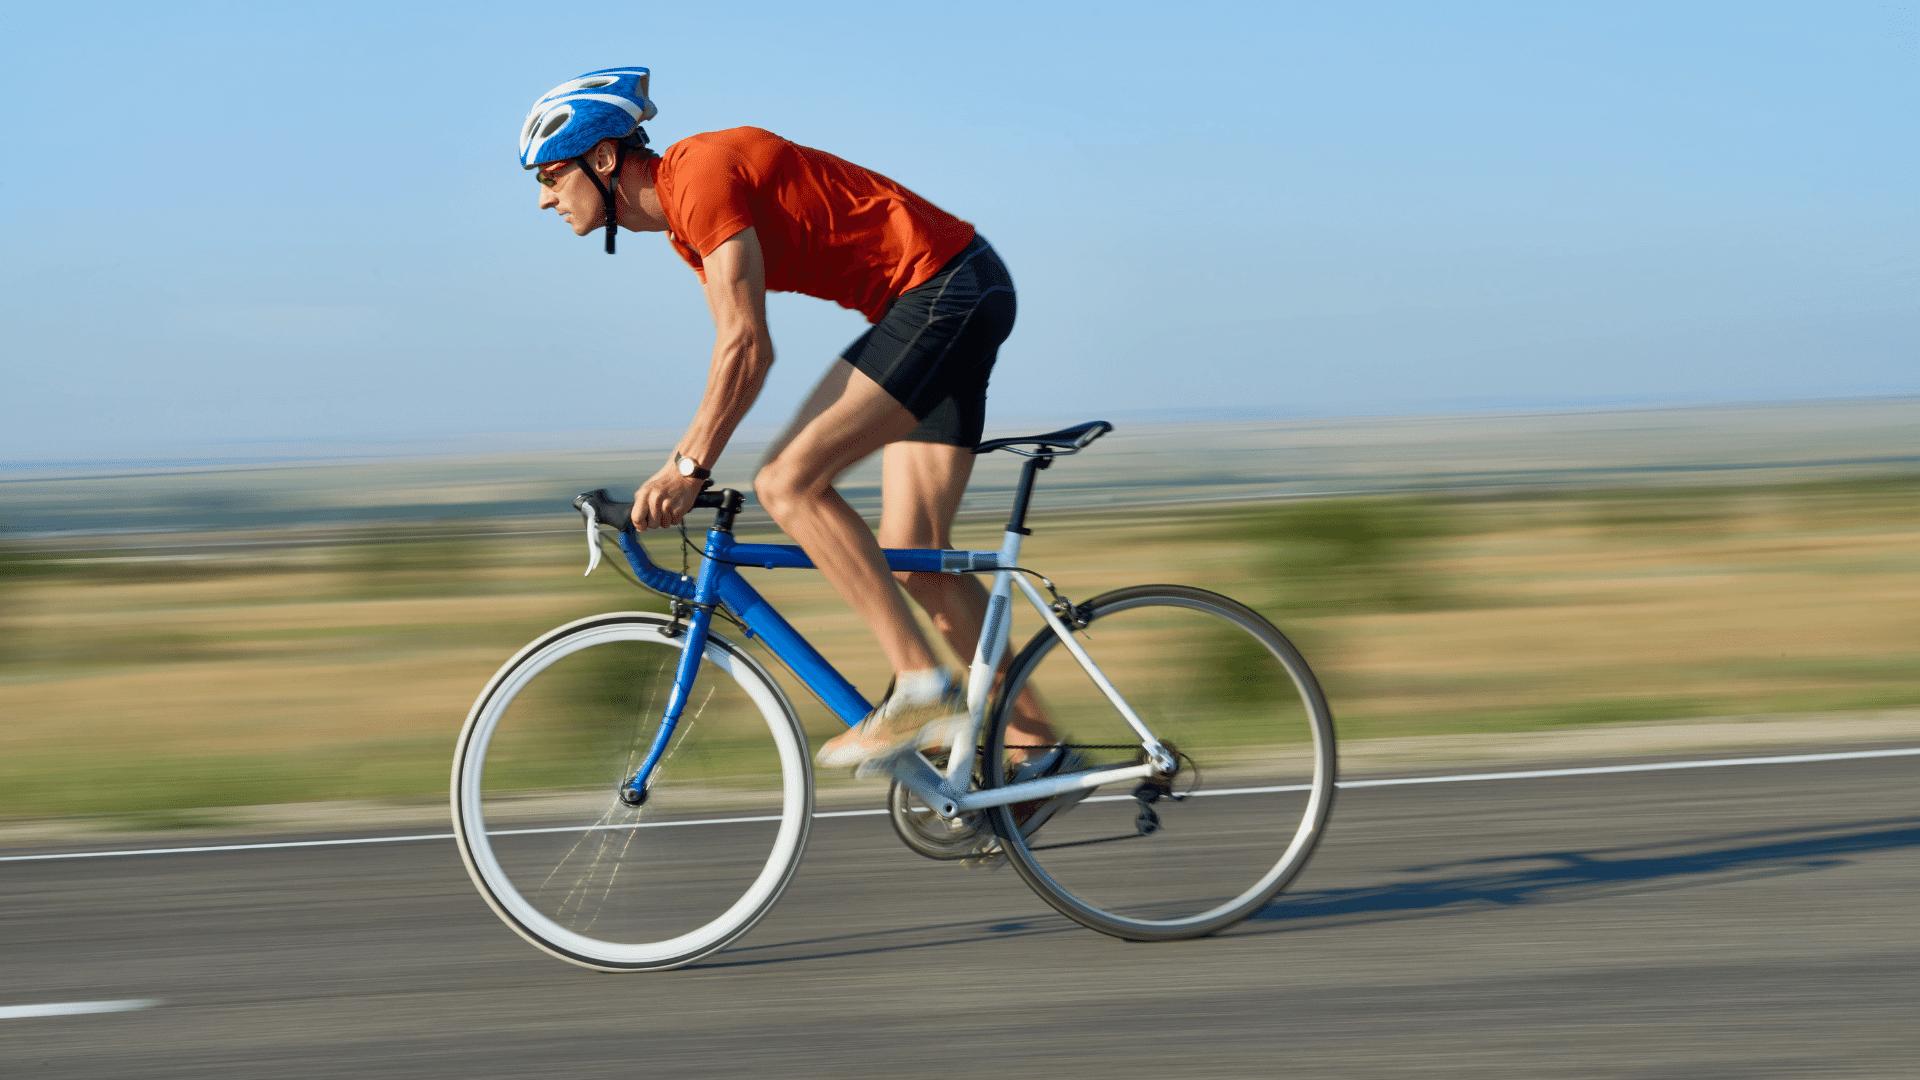 bicicletas de carretera baratas